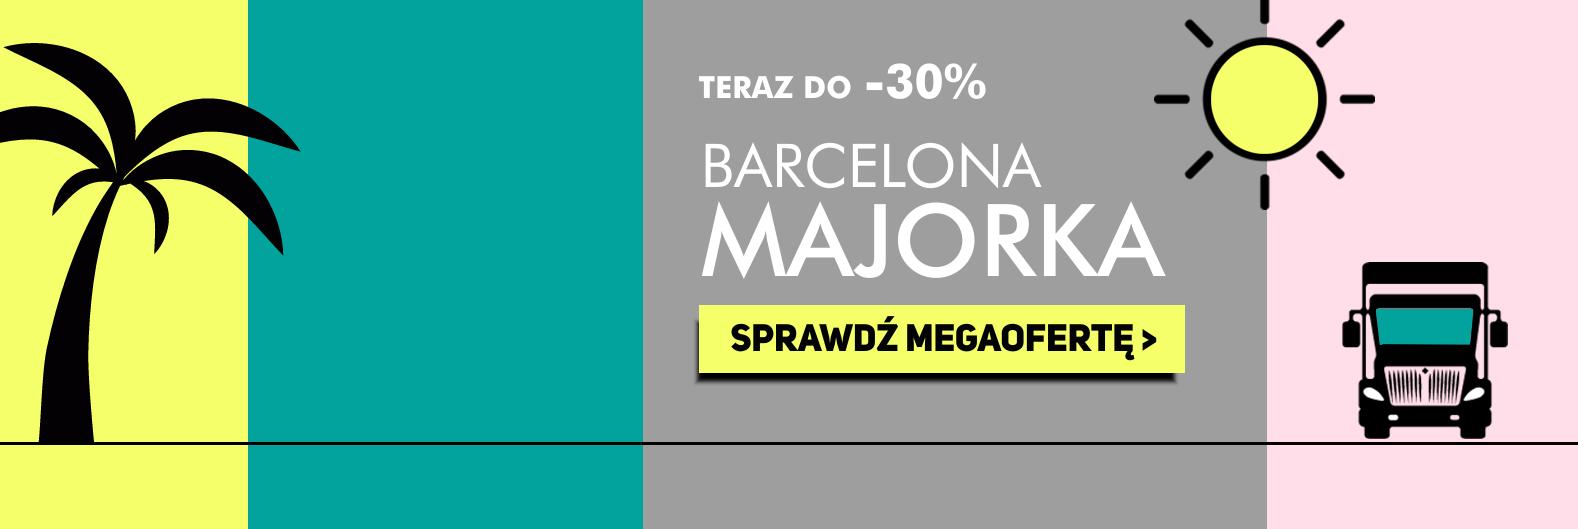 Prom Barcelona Majorka